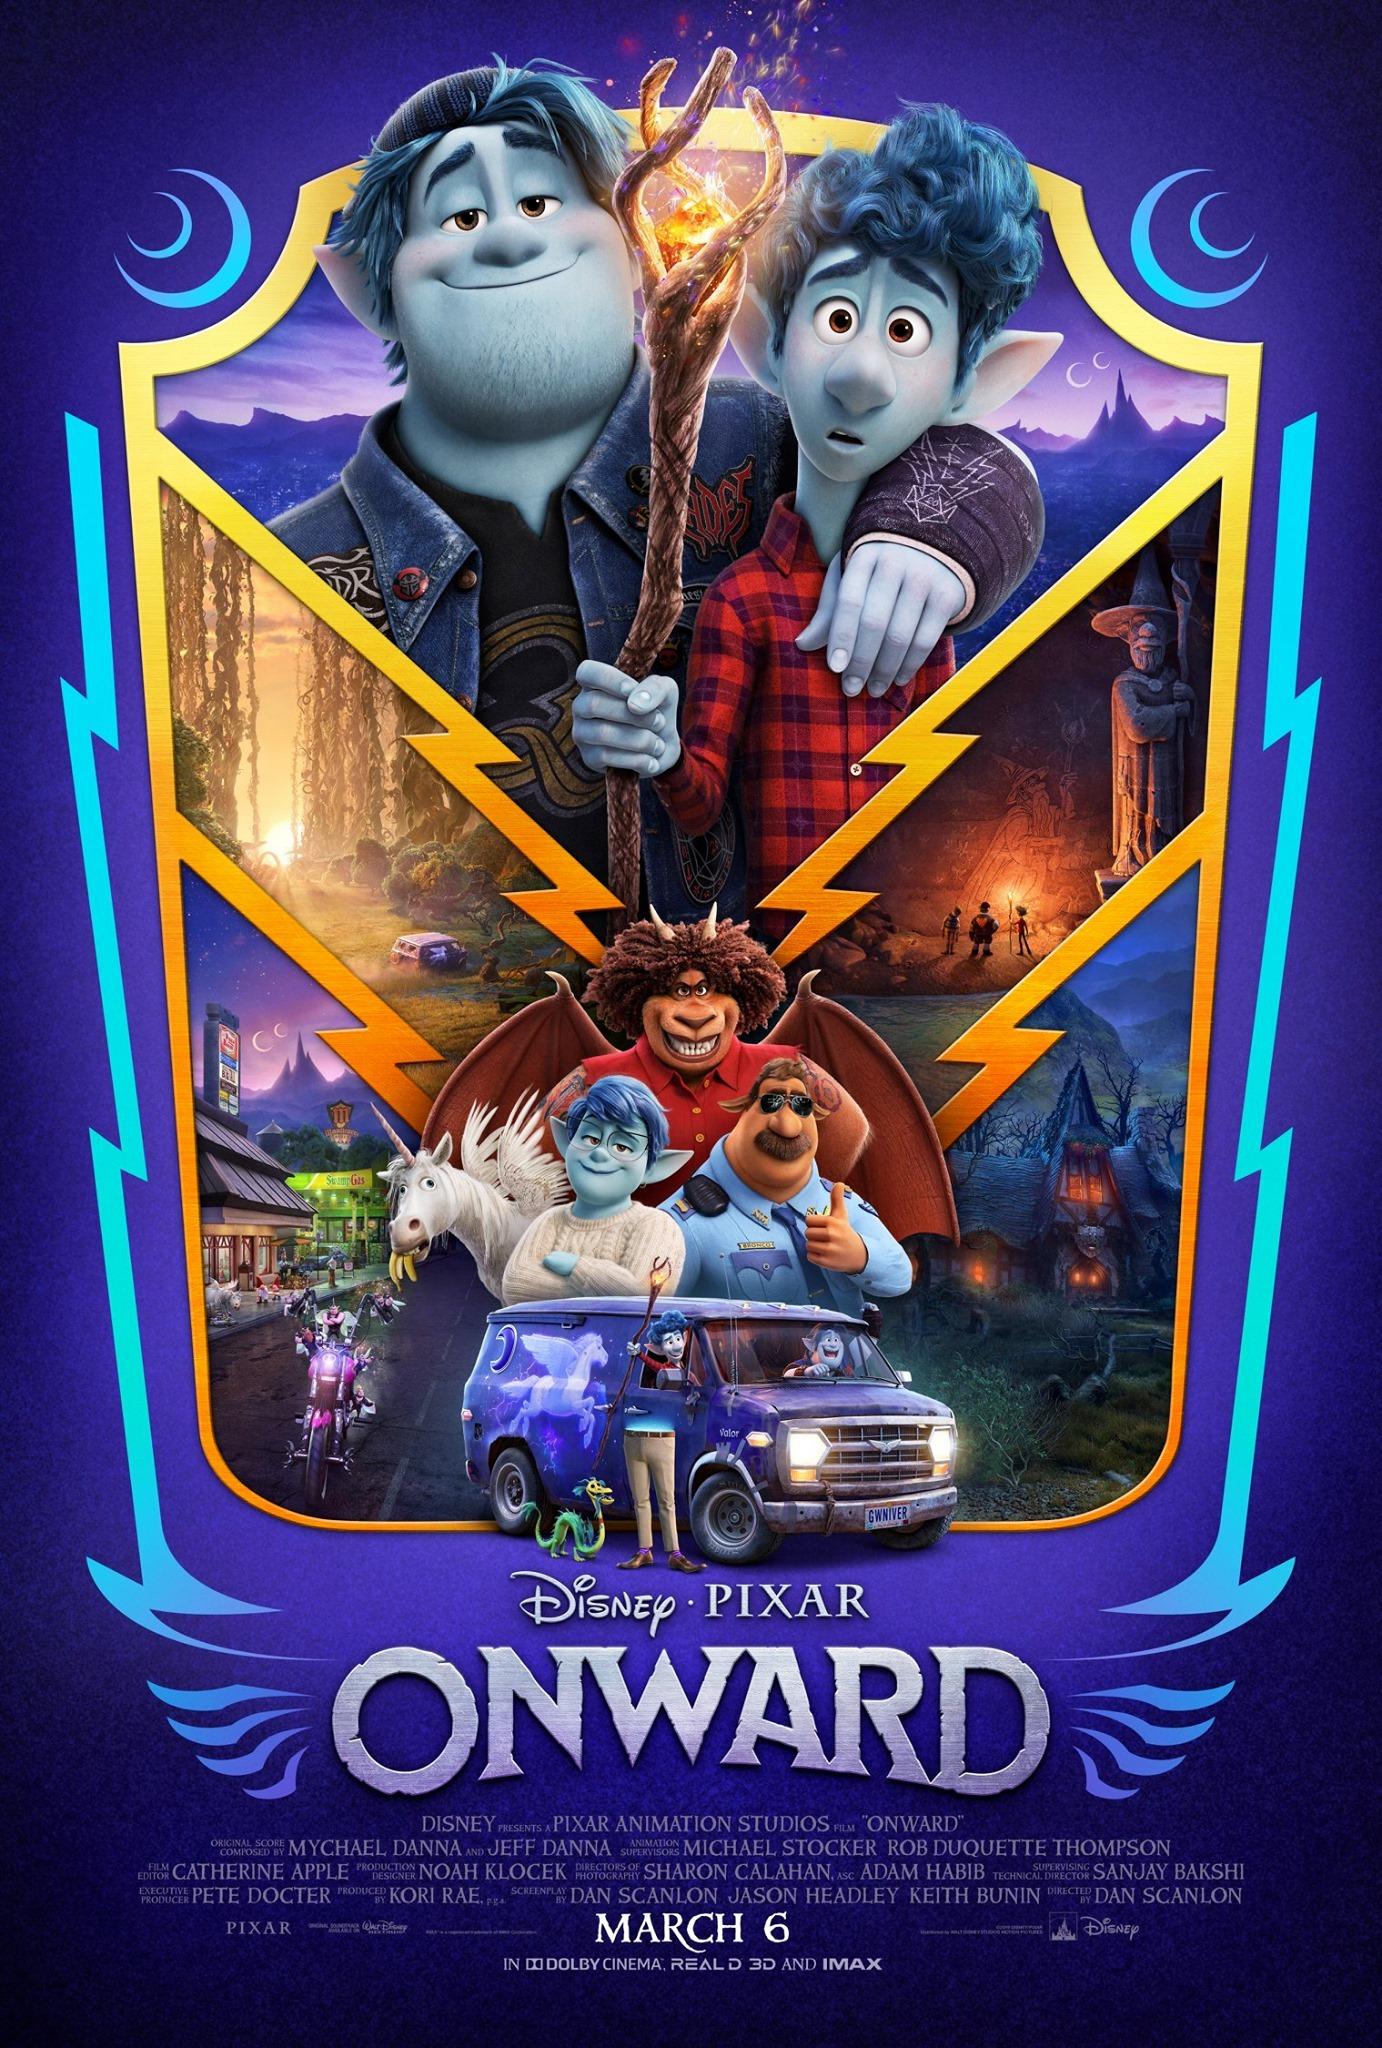 szmk_onward_elore_pixar_disney_animaacos_film_5.jpg